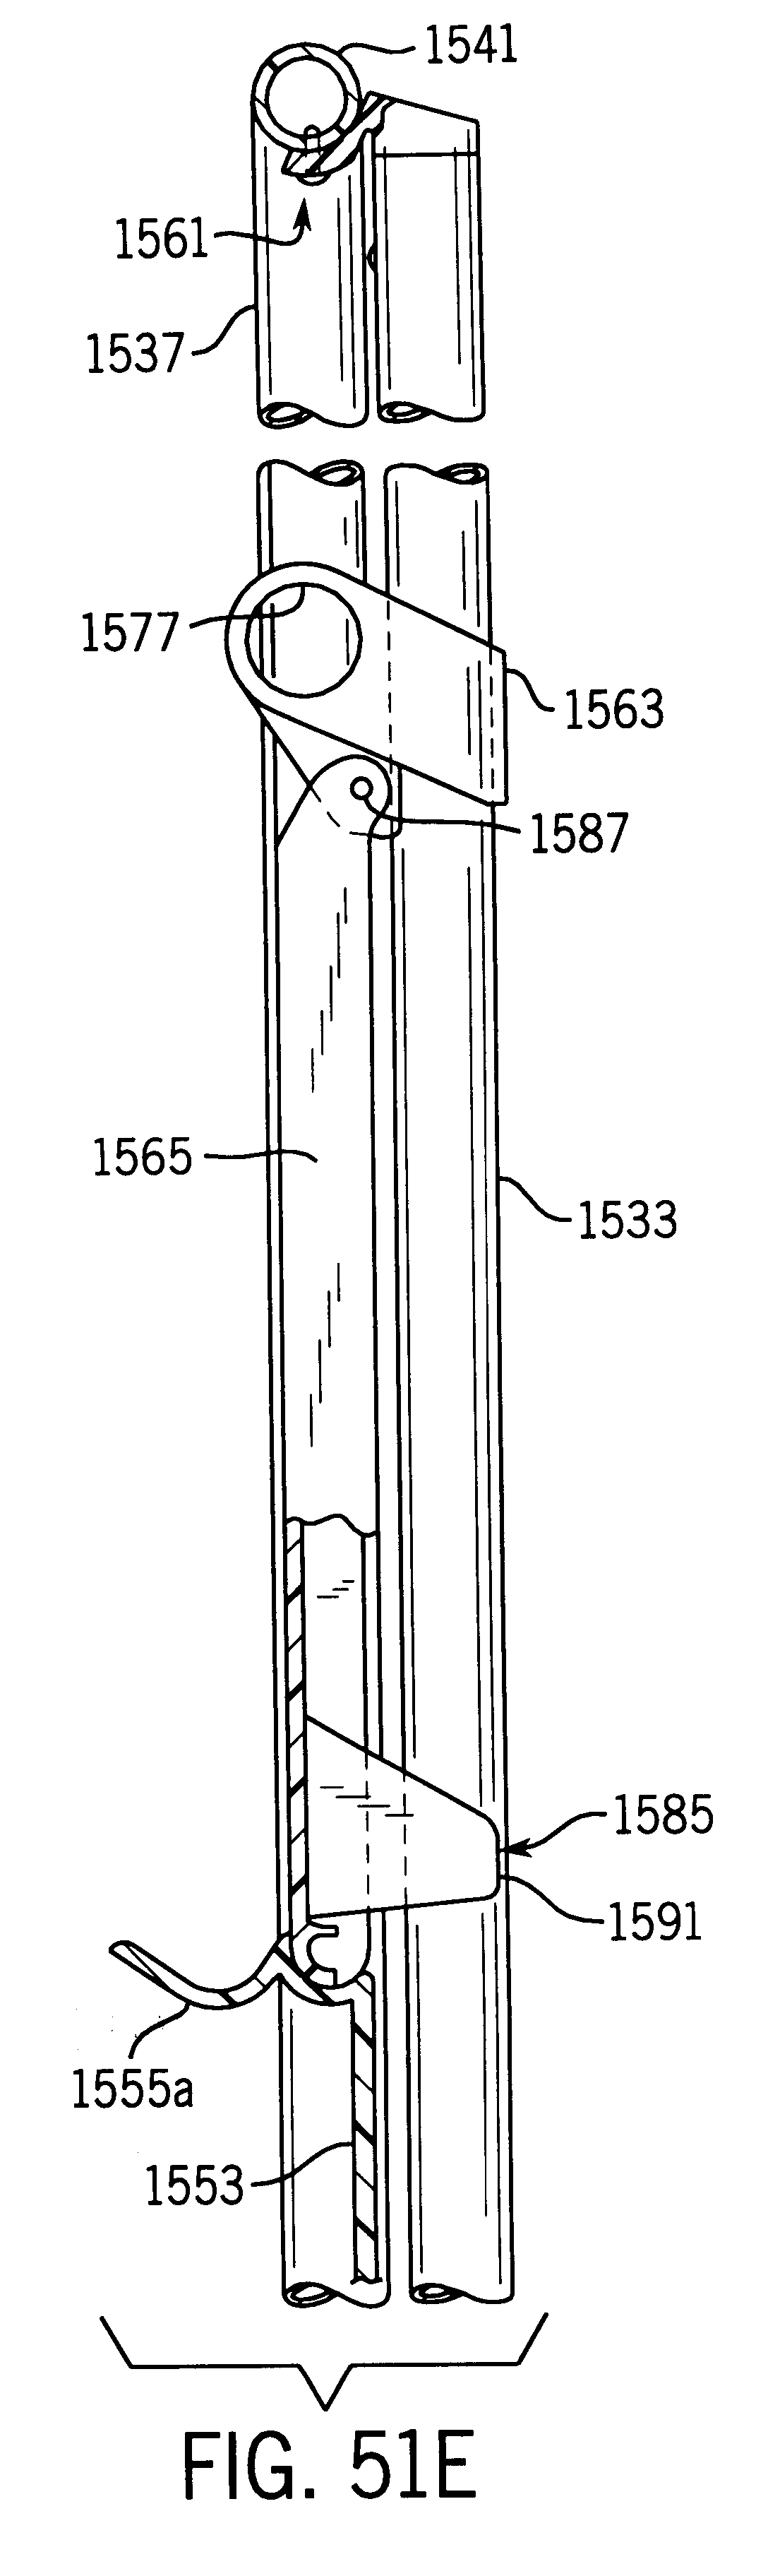 Pollak 34 586 Wiring Diagram